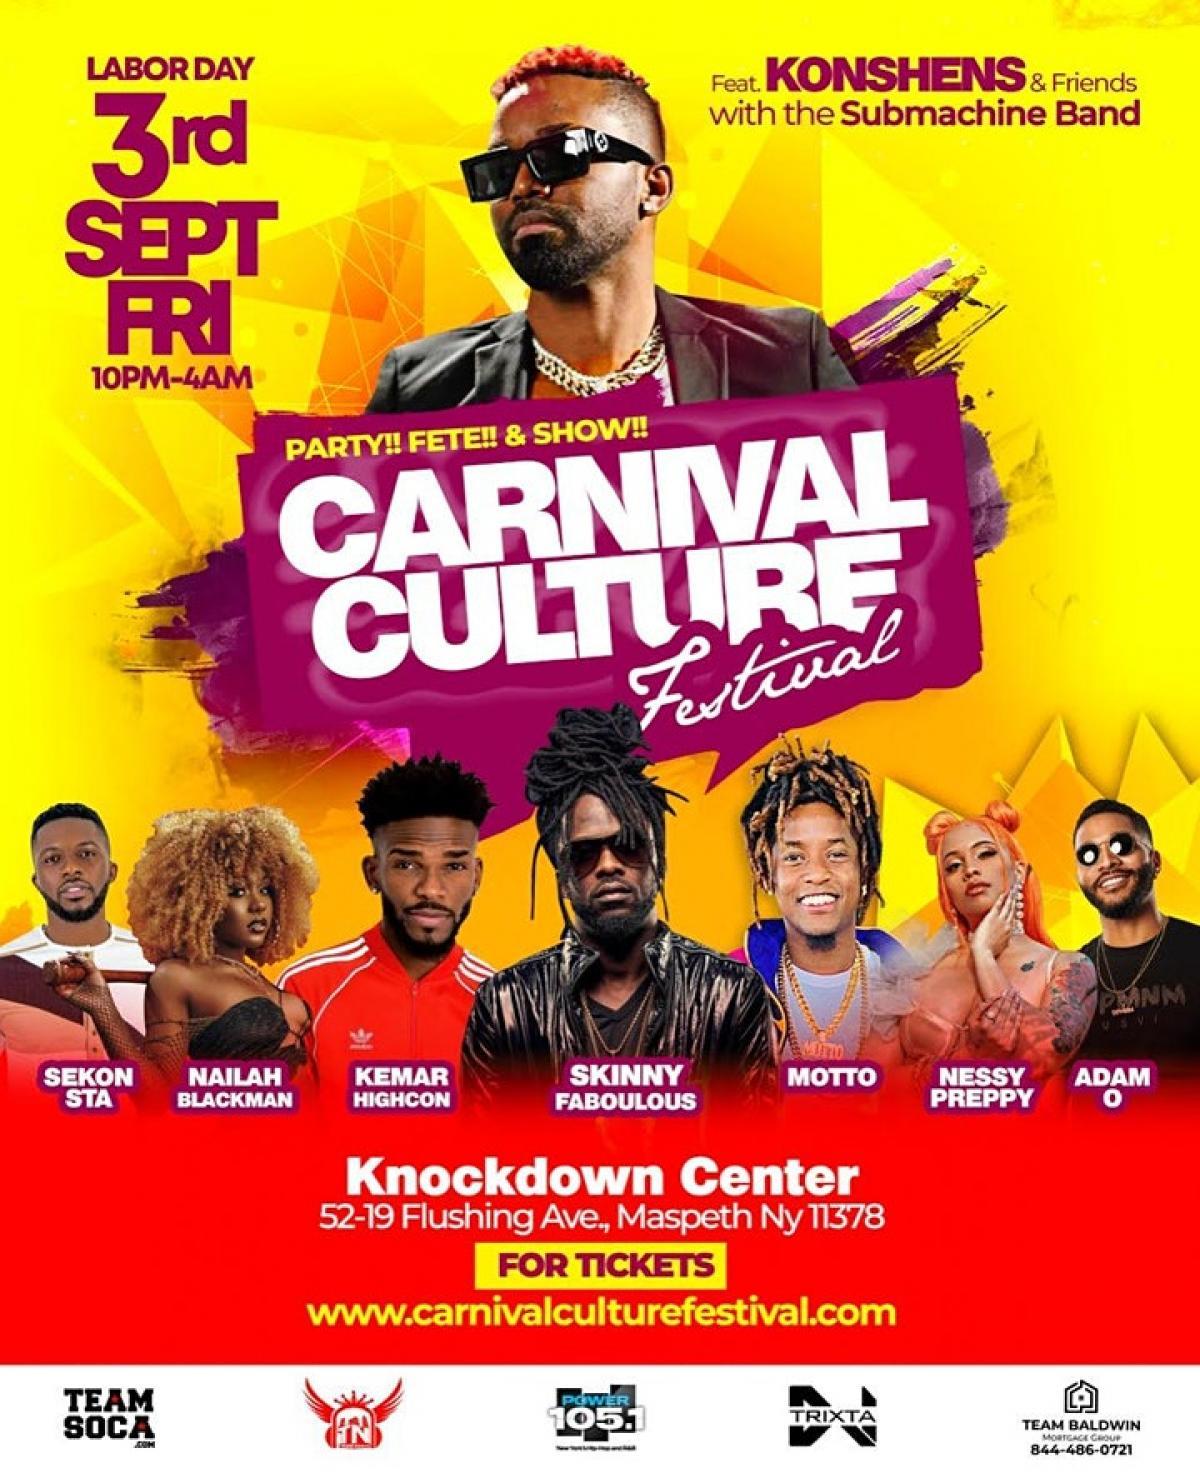 Carnival Culture Festival flyer or graphic.